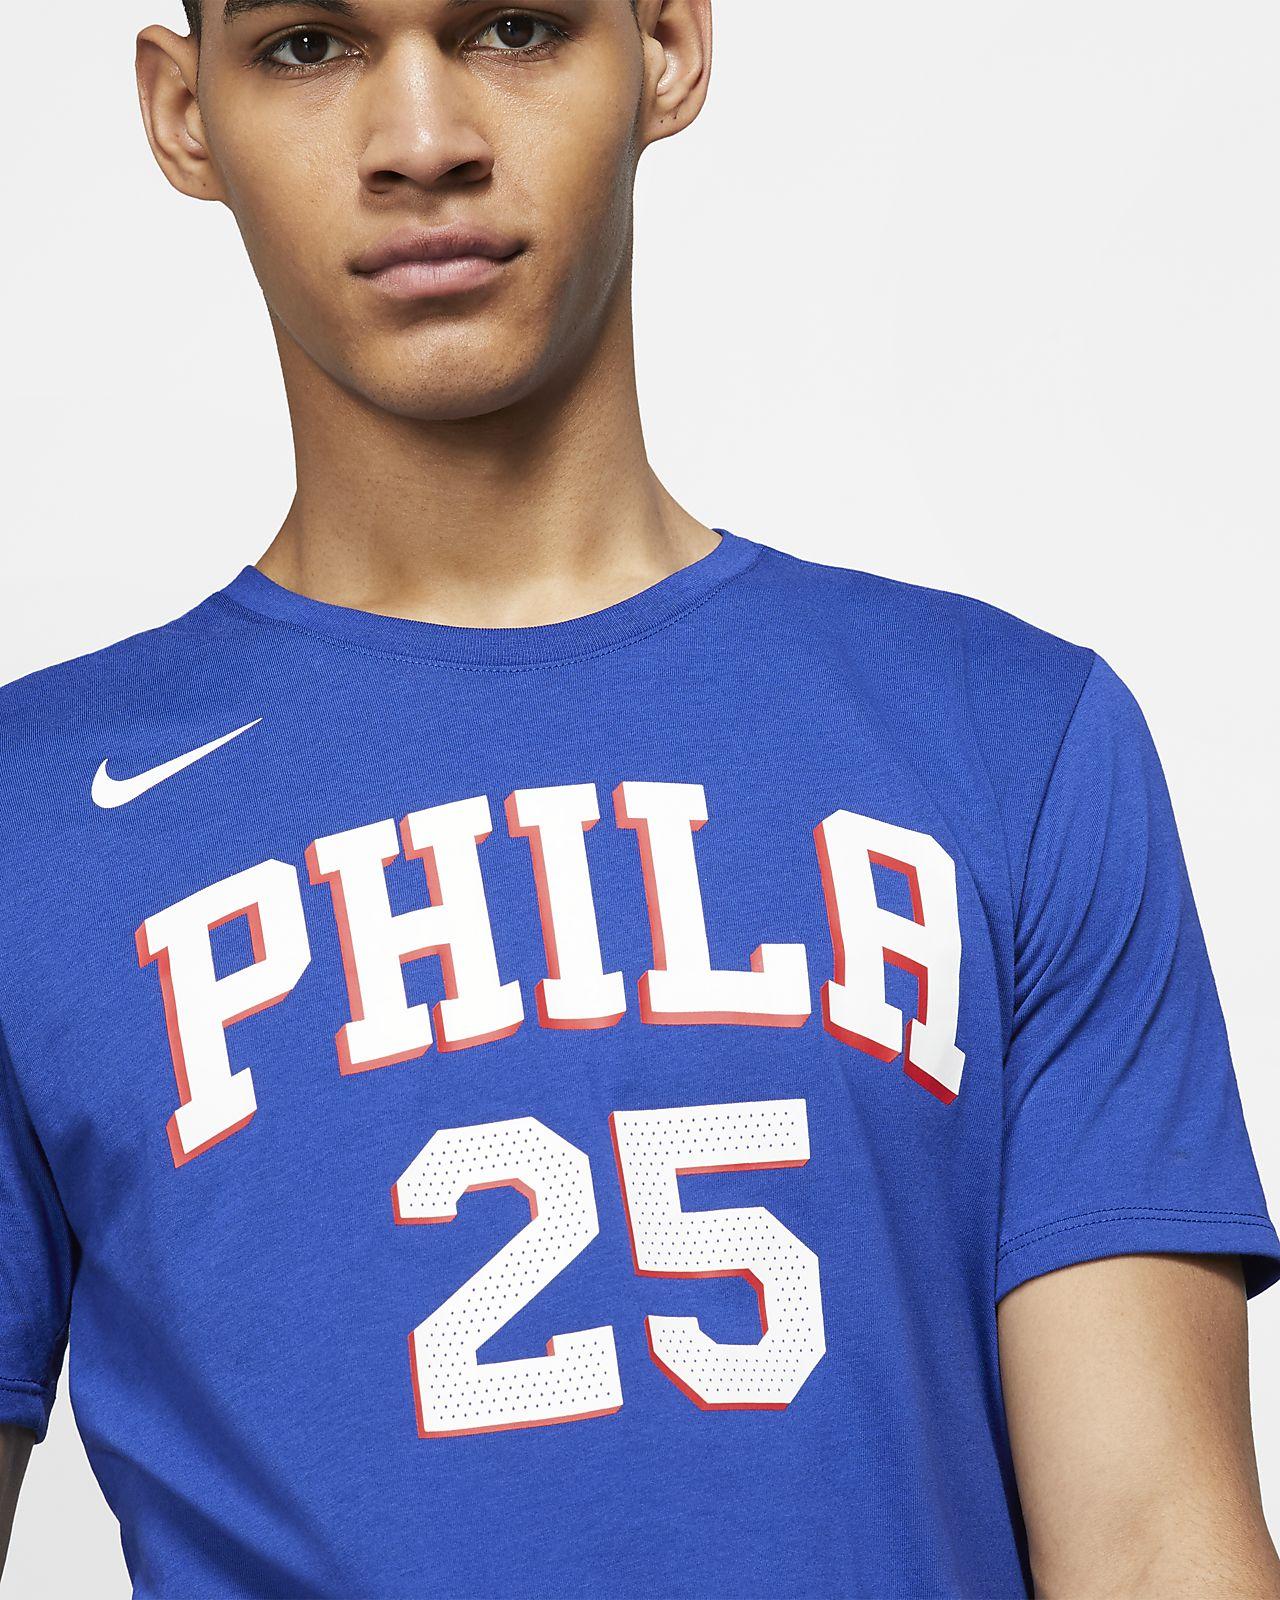 hot sale online 29196 ffe1e Ben Simmons Philadelphia 76ers Nike Dri-FIT Men's NBA T-Shirt